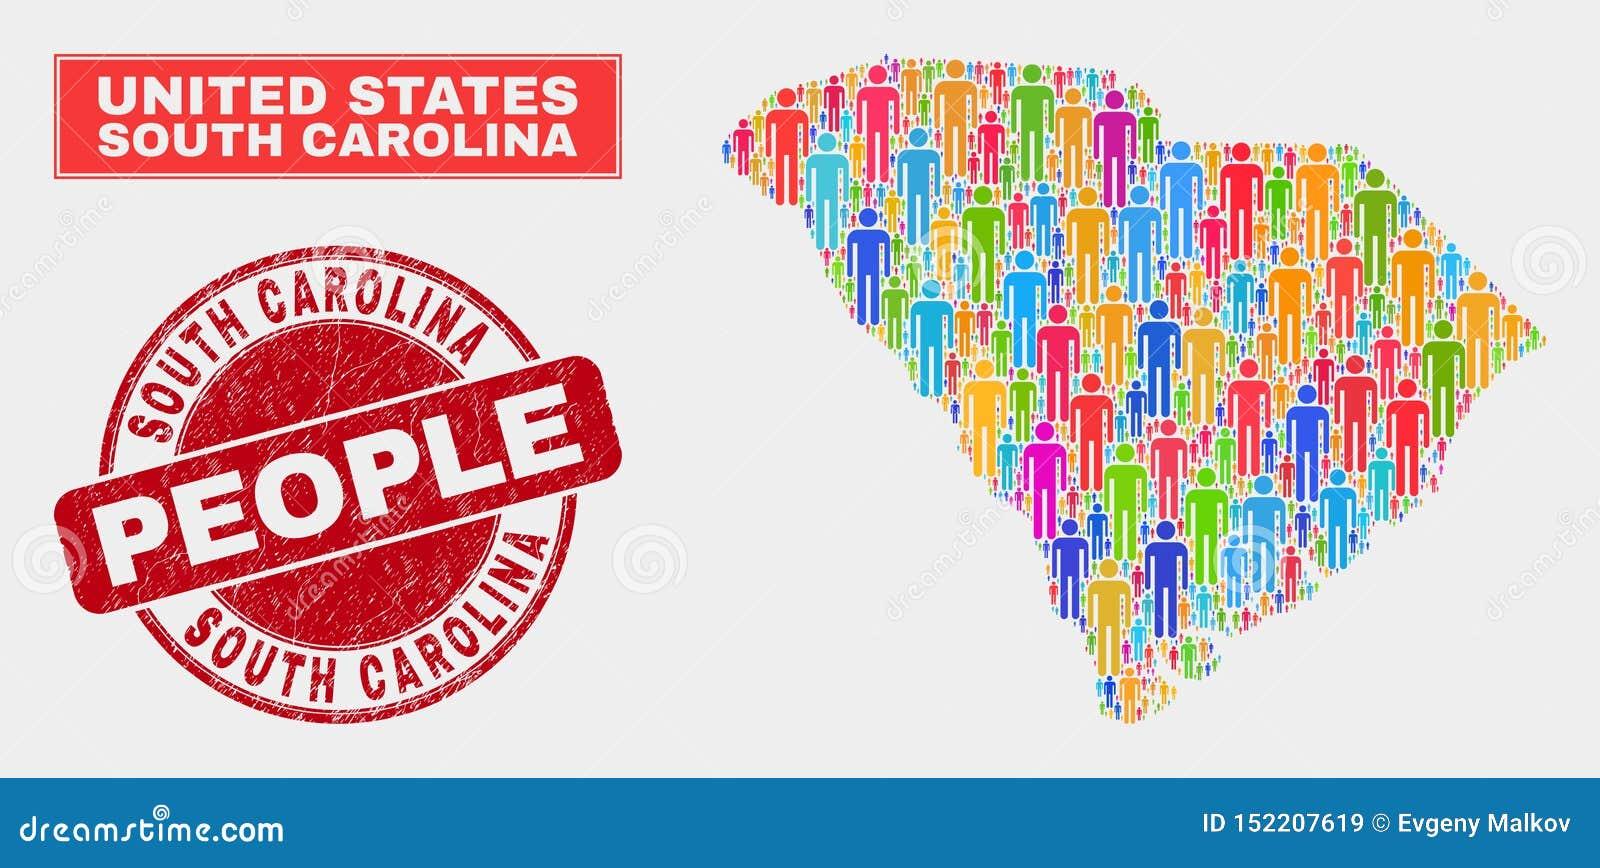 South Carolina State Map Potion Demographics And ... on map of seattle demographics, map of dc demographics, map of raleigh demographics, map of st. louis demographics, map of african american demographics, map of chicago demographics, map of india demographics, map of orlando demographics,